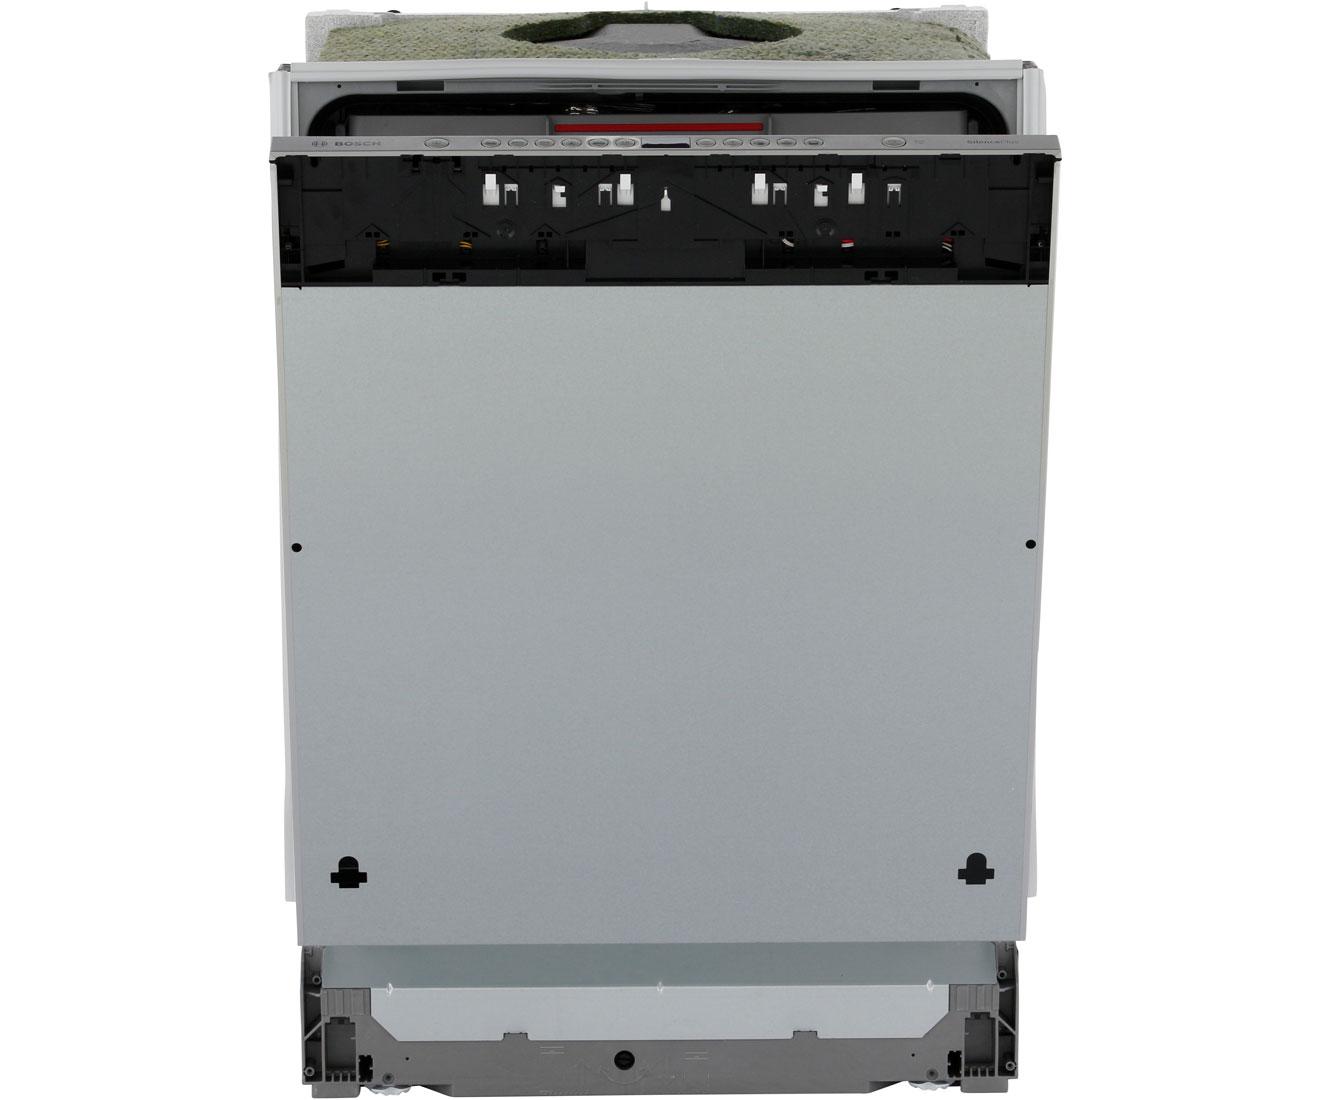 bosch smv46kx00e serie 4 geschirrsp ler eingebaut 60cm edelstahl neu ebay. Black Bedroom Furniture Sets. Home Design Ideas